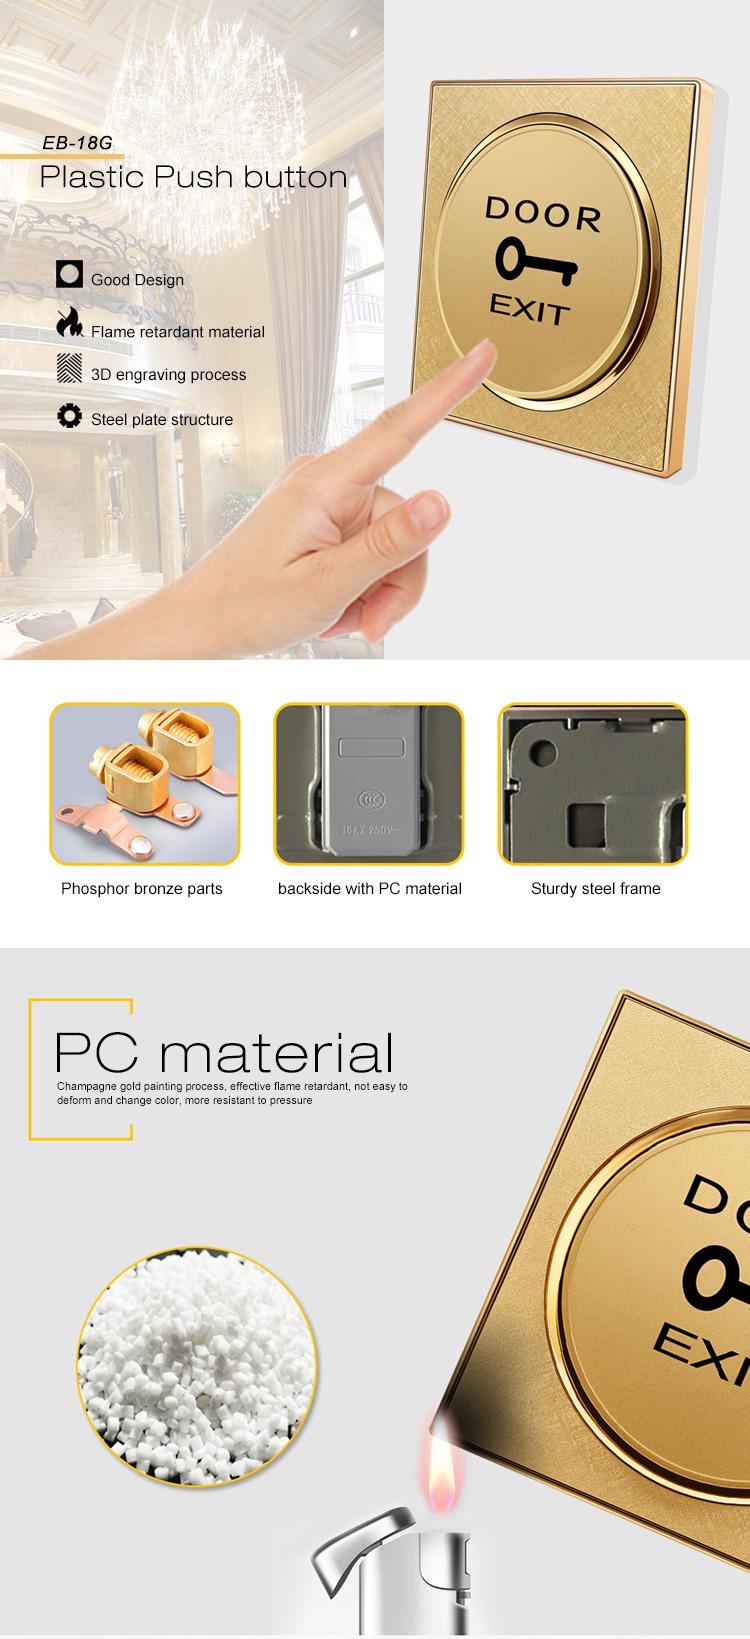 Plastic Push button